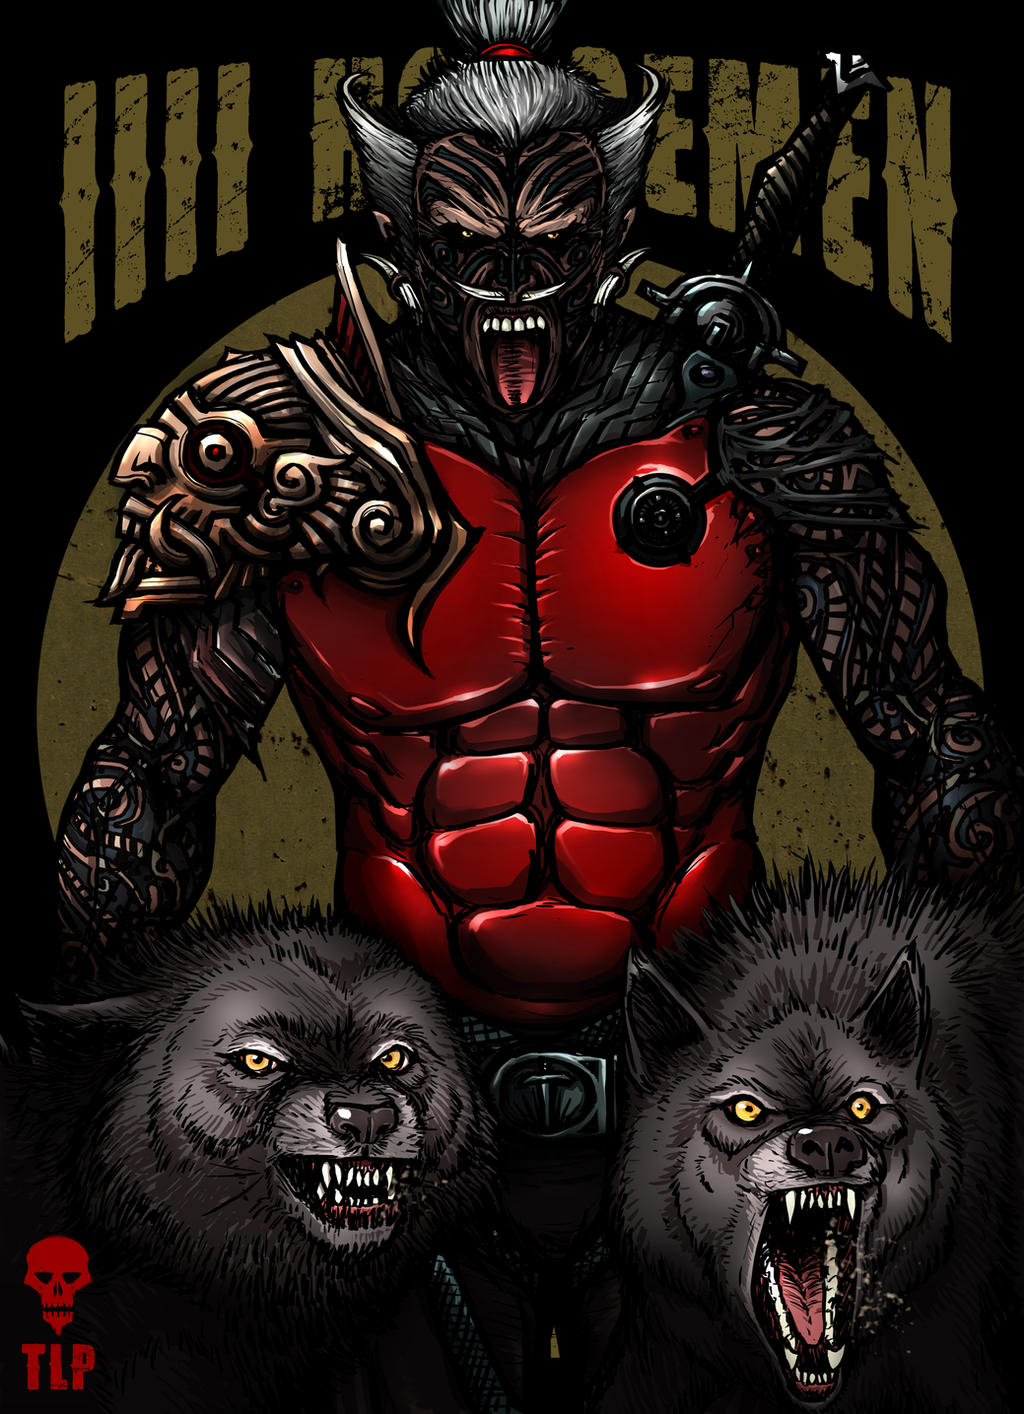 4 Horsemen War Character by The-Last-Phantom